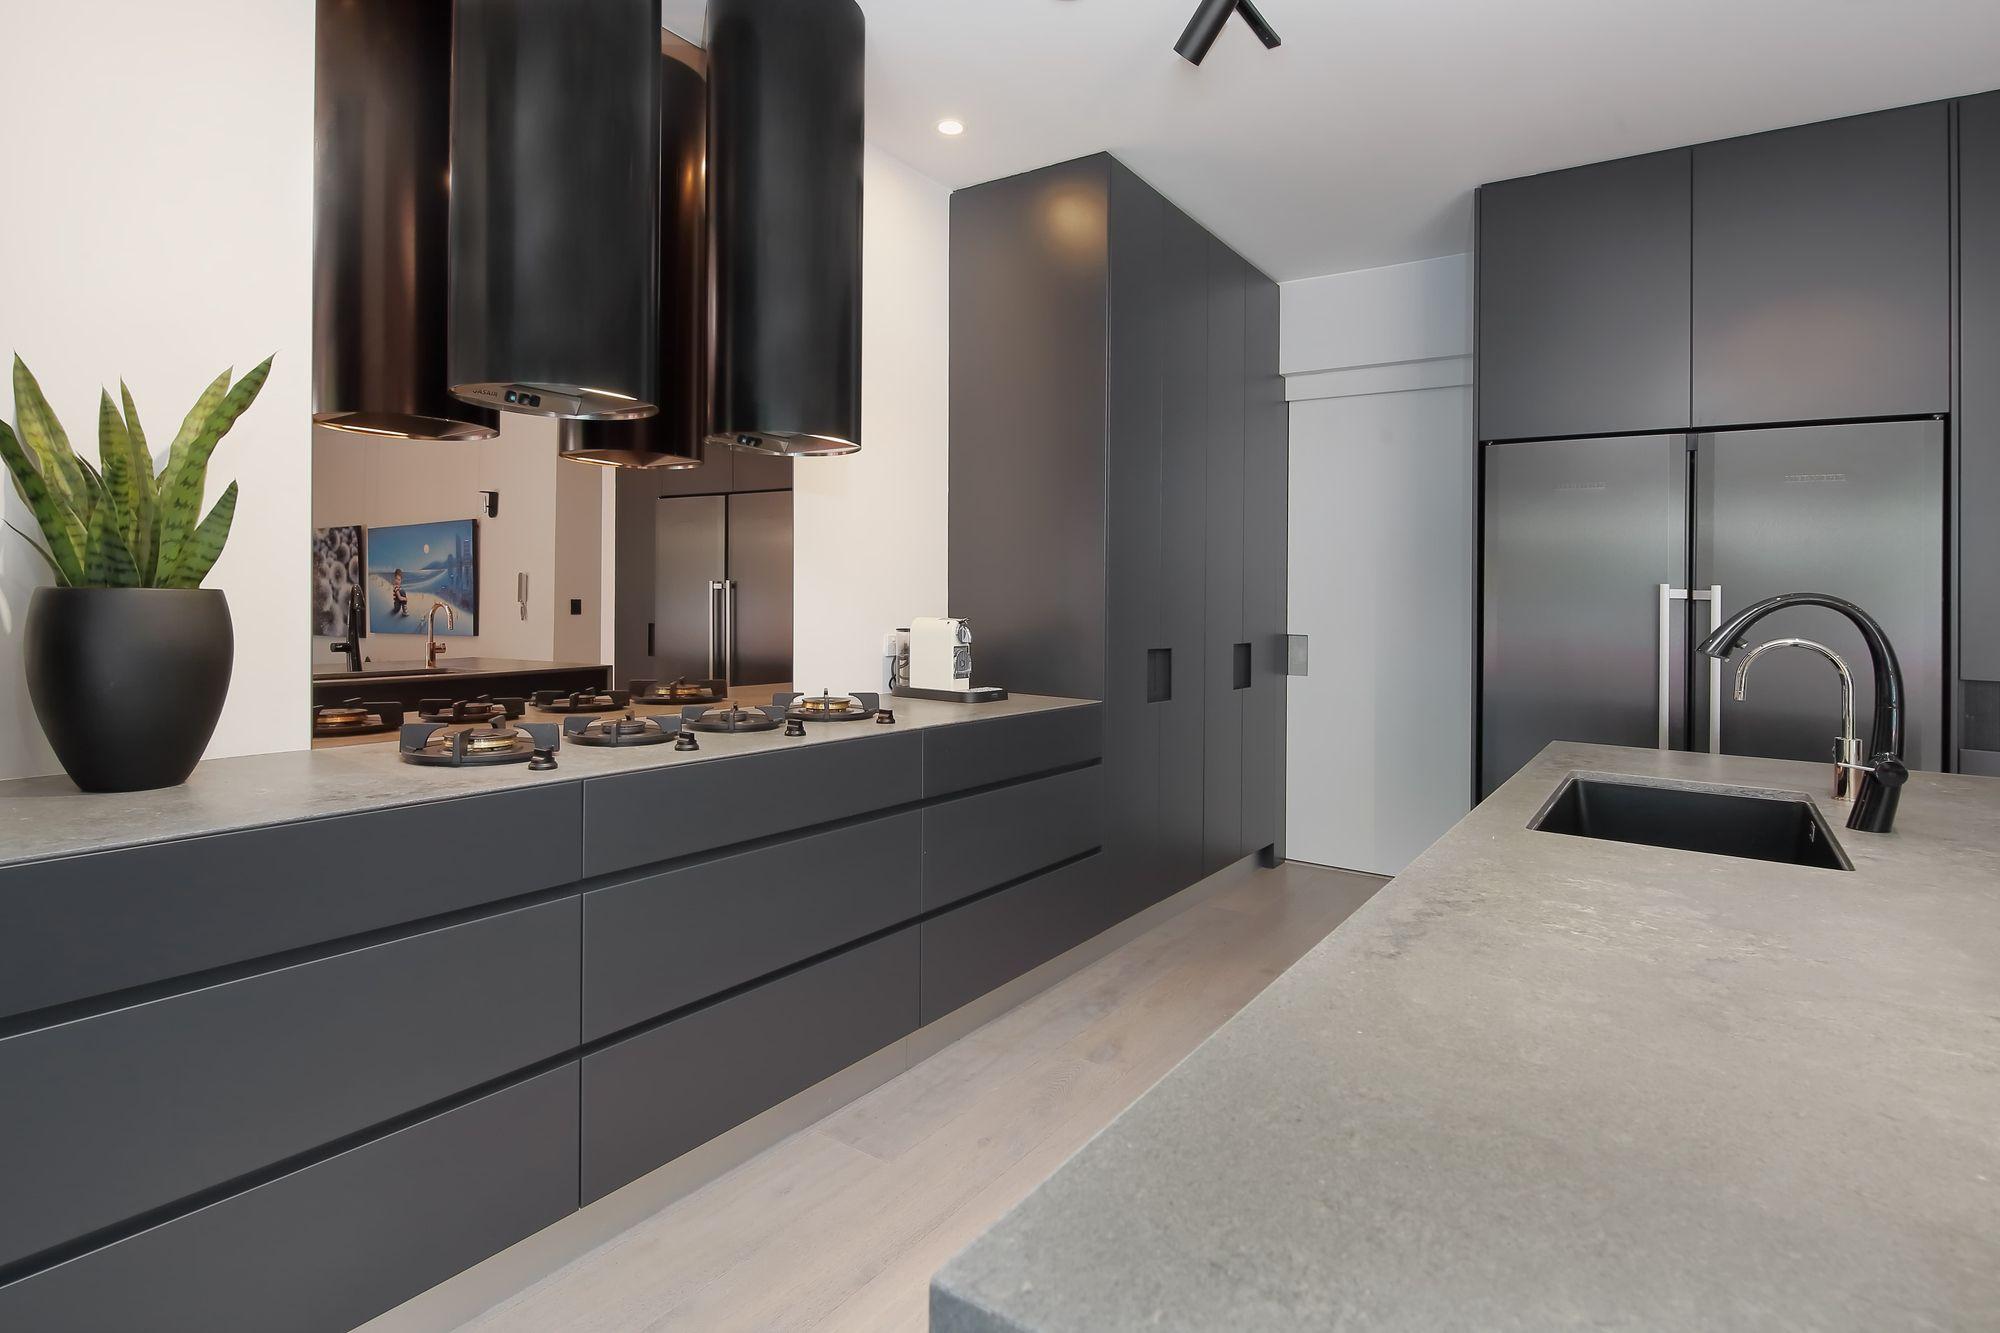 Impala Kitchens Create A Sleek Kitchen Design With Caesarstone Rugged Concrete Benchtops Cylindrical In 2020 Sleek Kitchen Design Contemporary Kitchen Sleek Kitchen